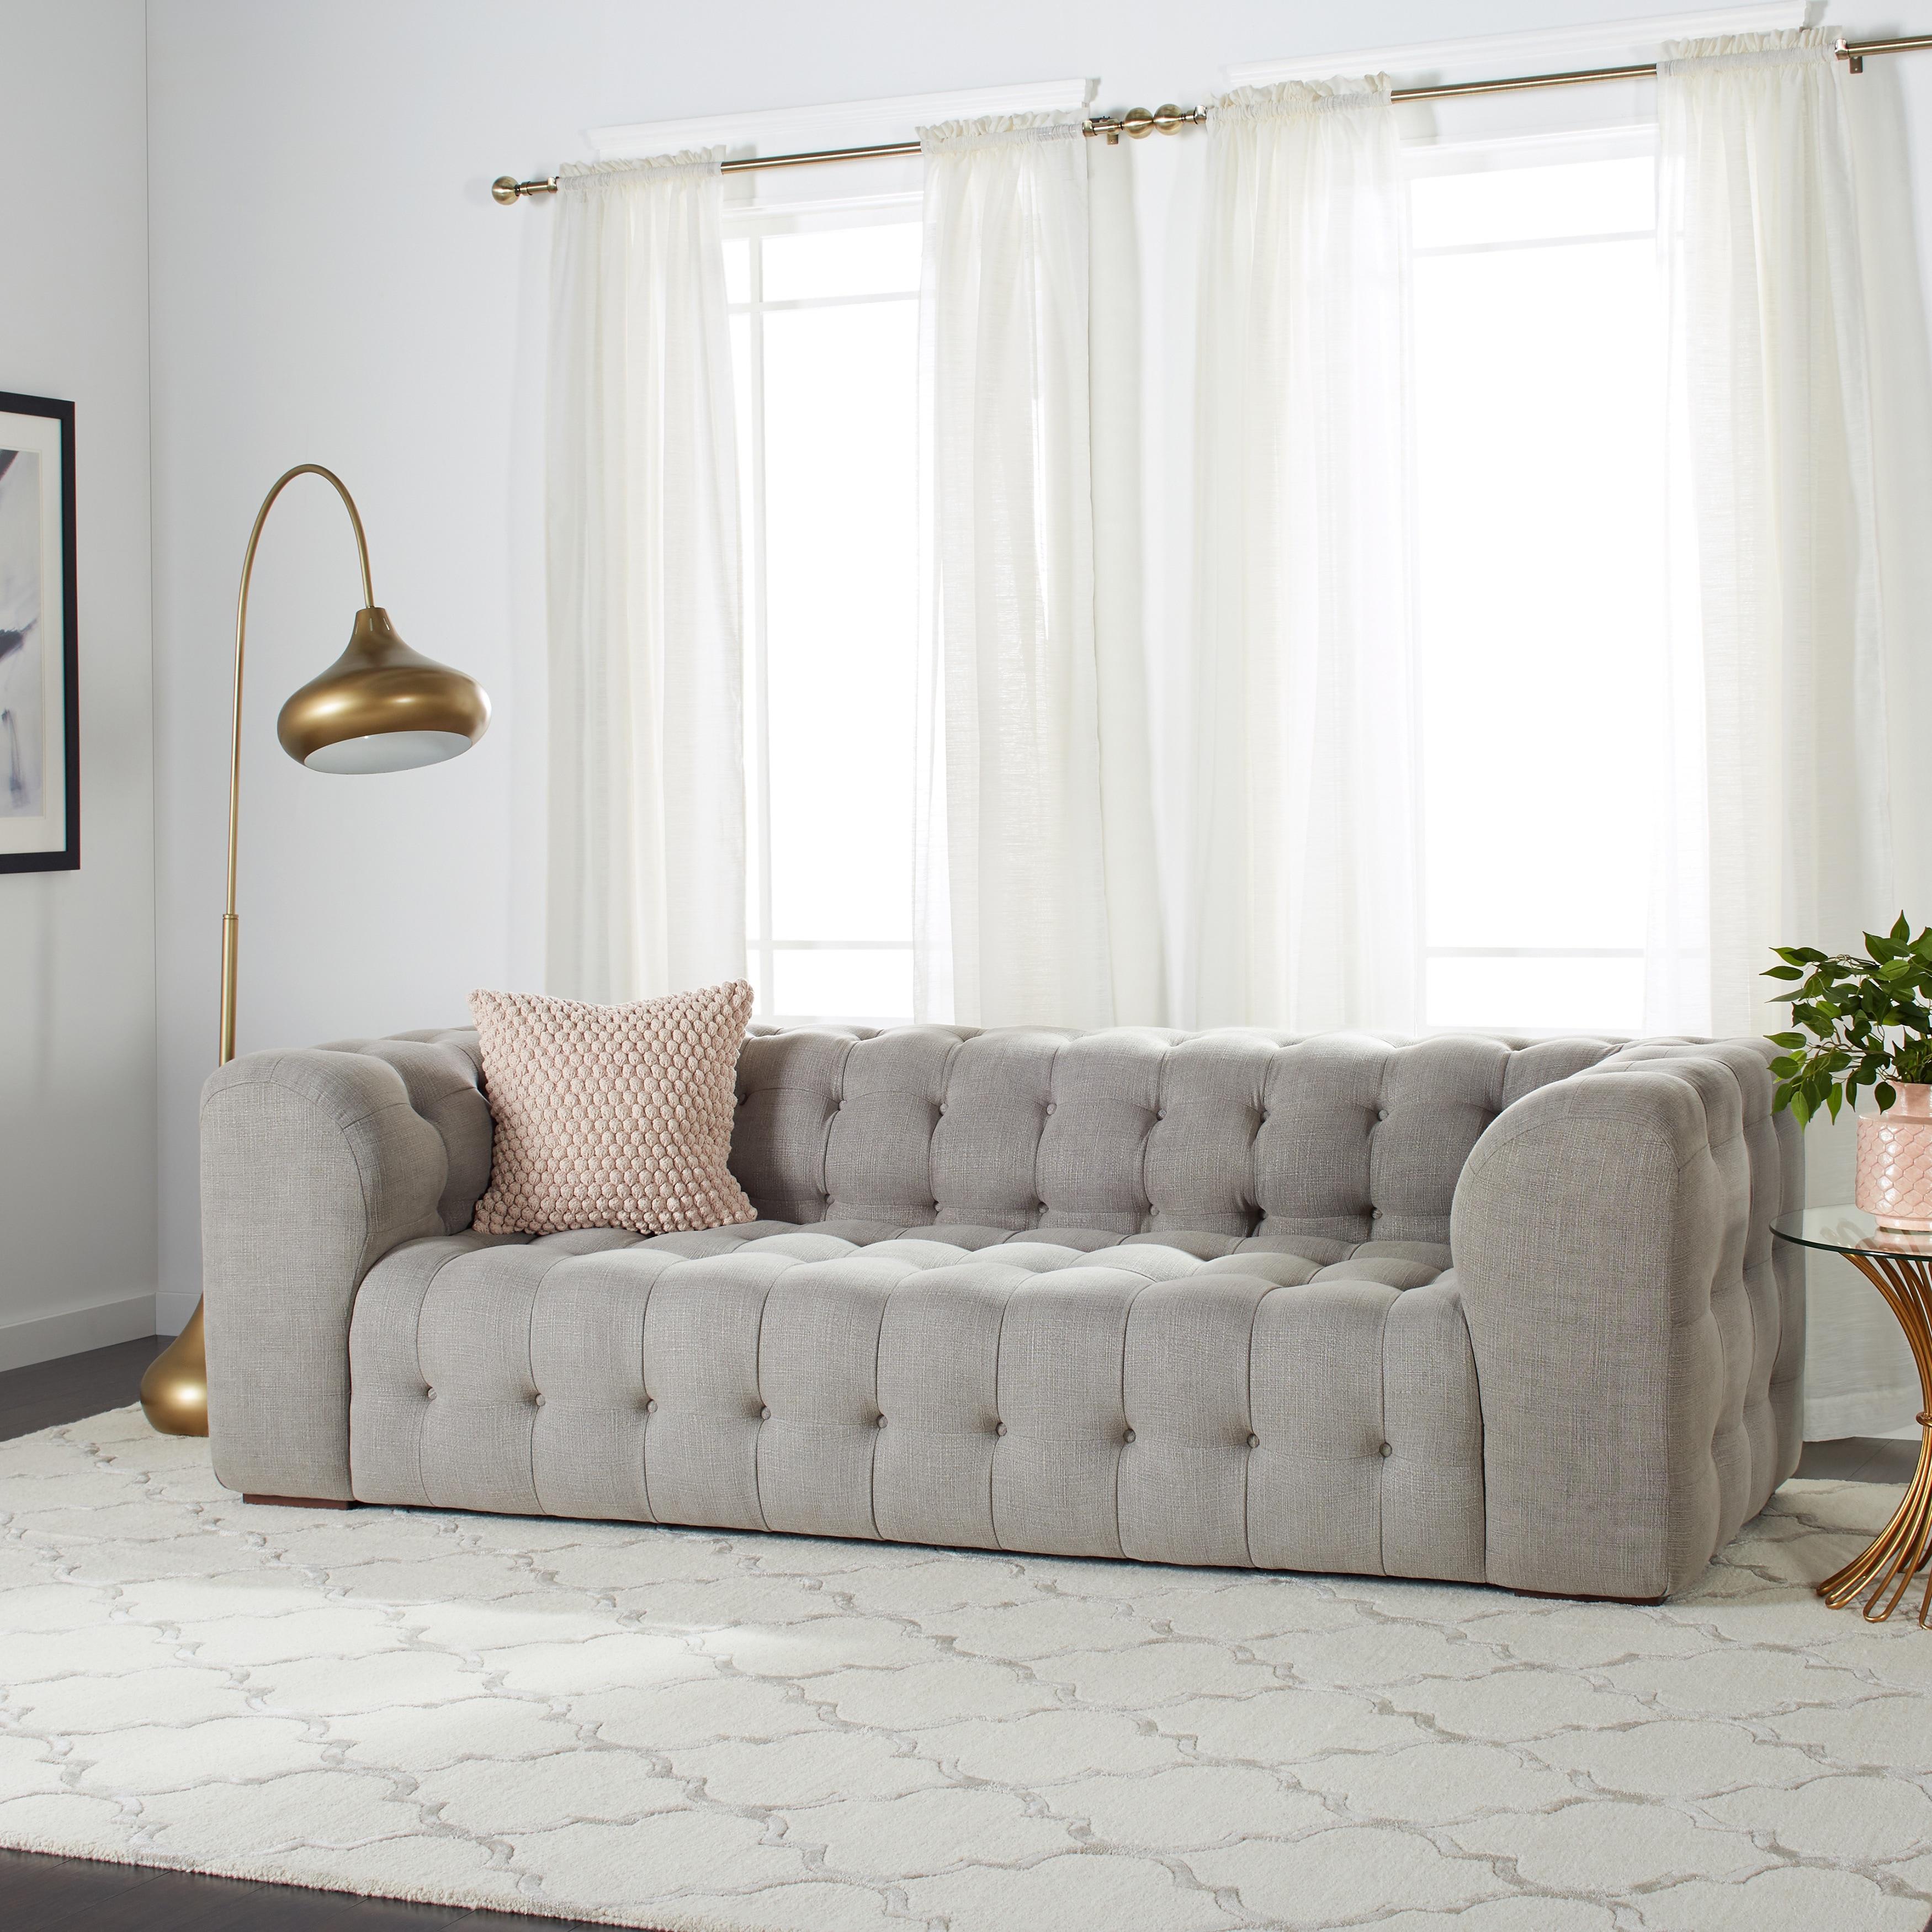 Elegant sofas living room | Sofas | Compare Prices at Nextag